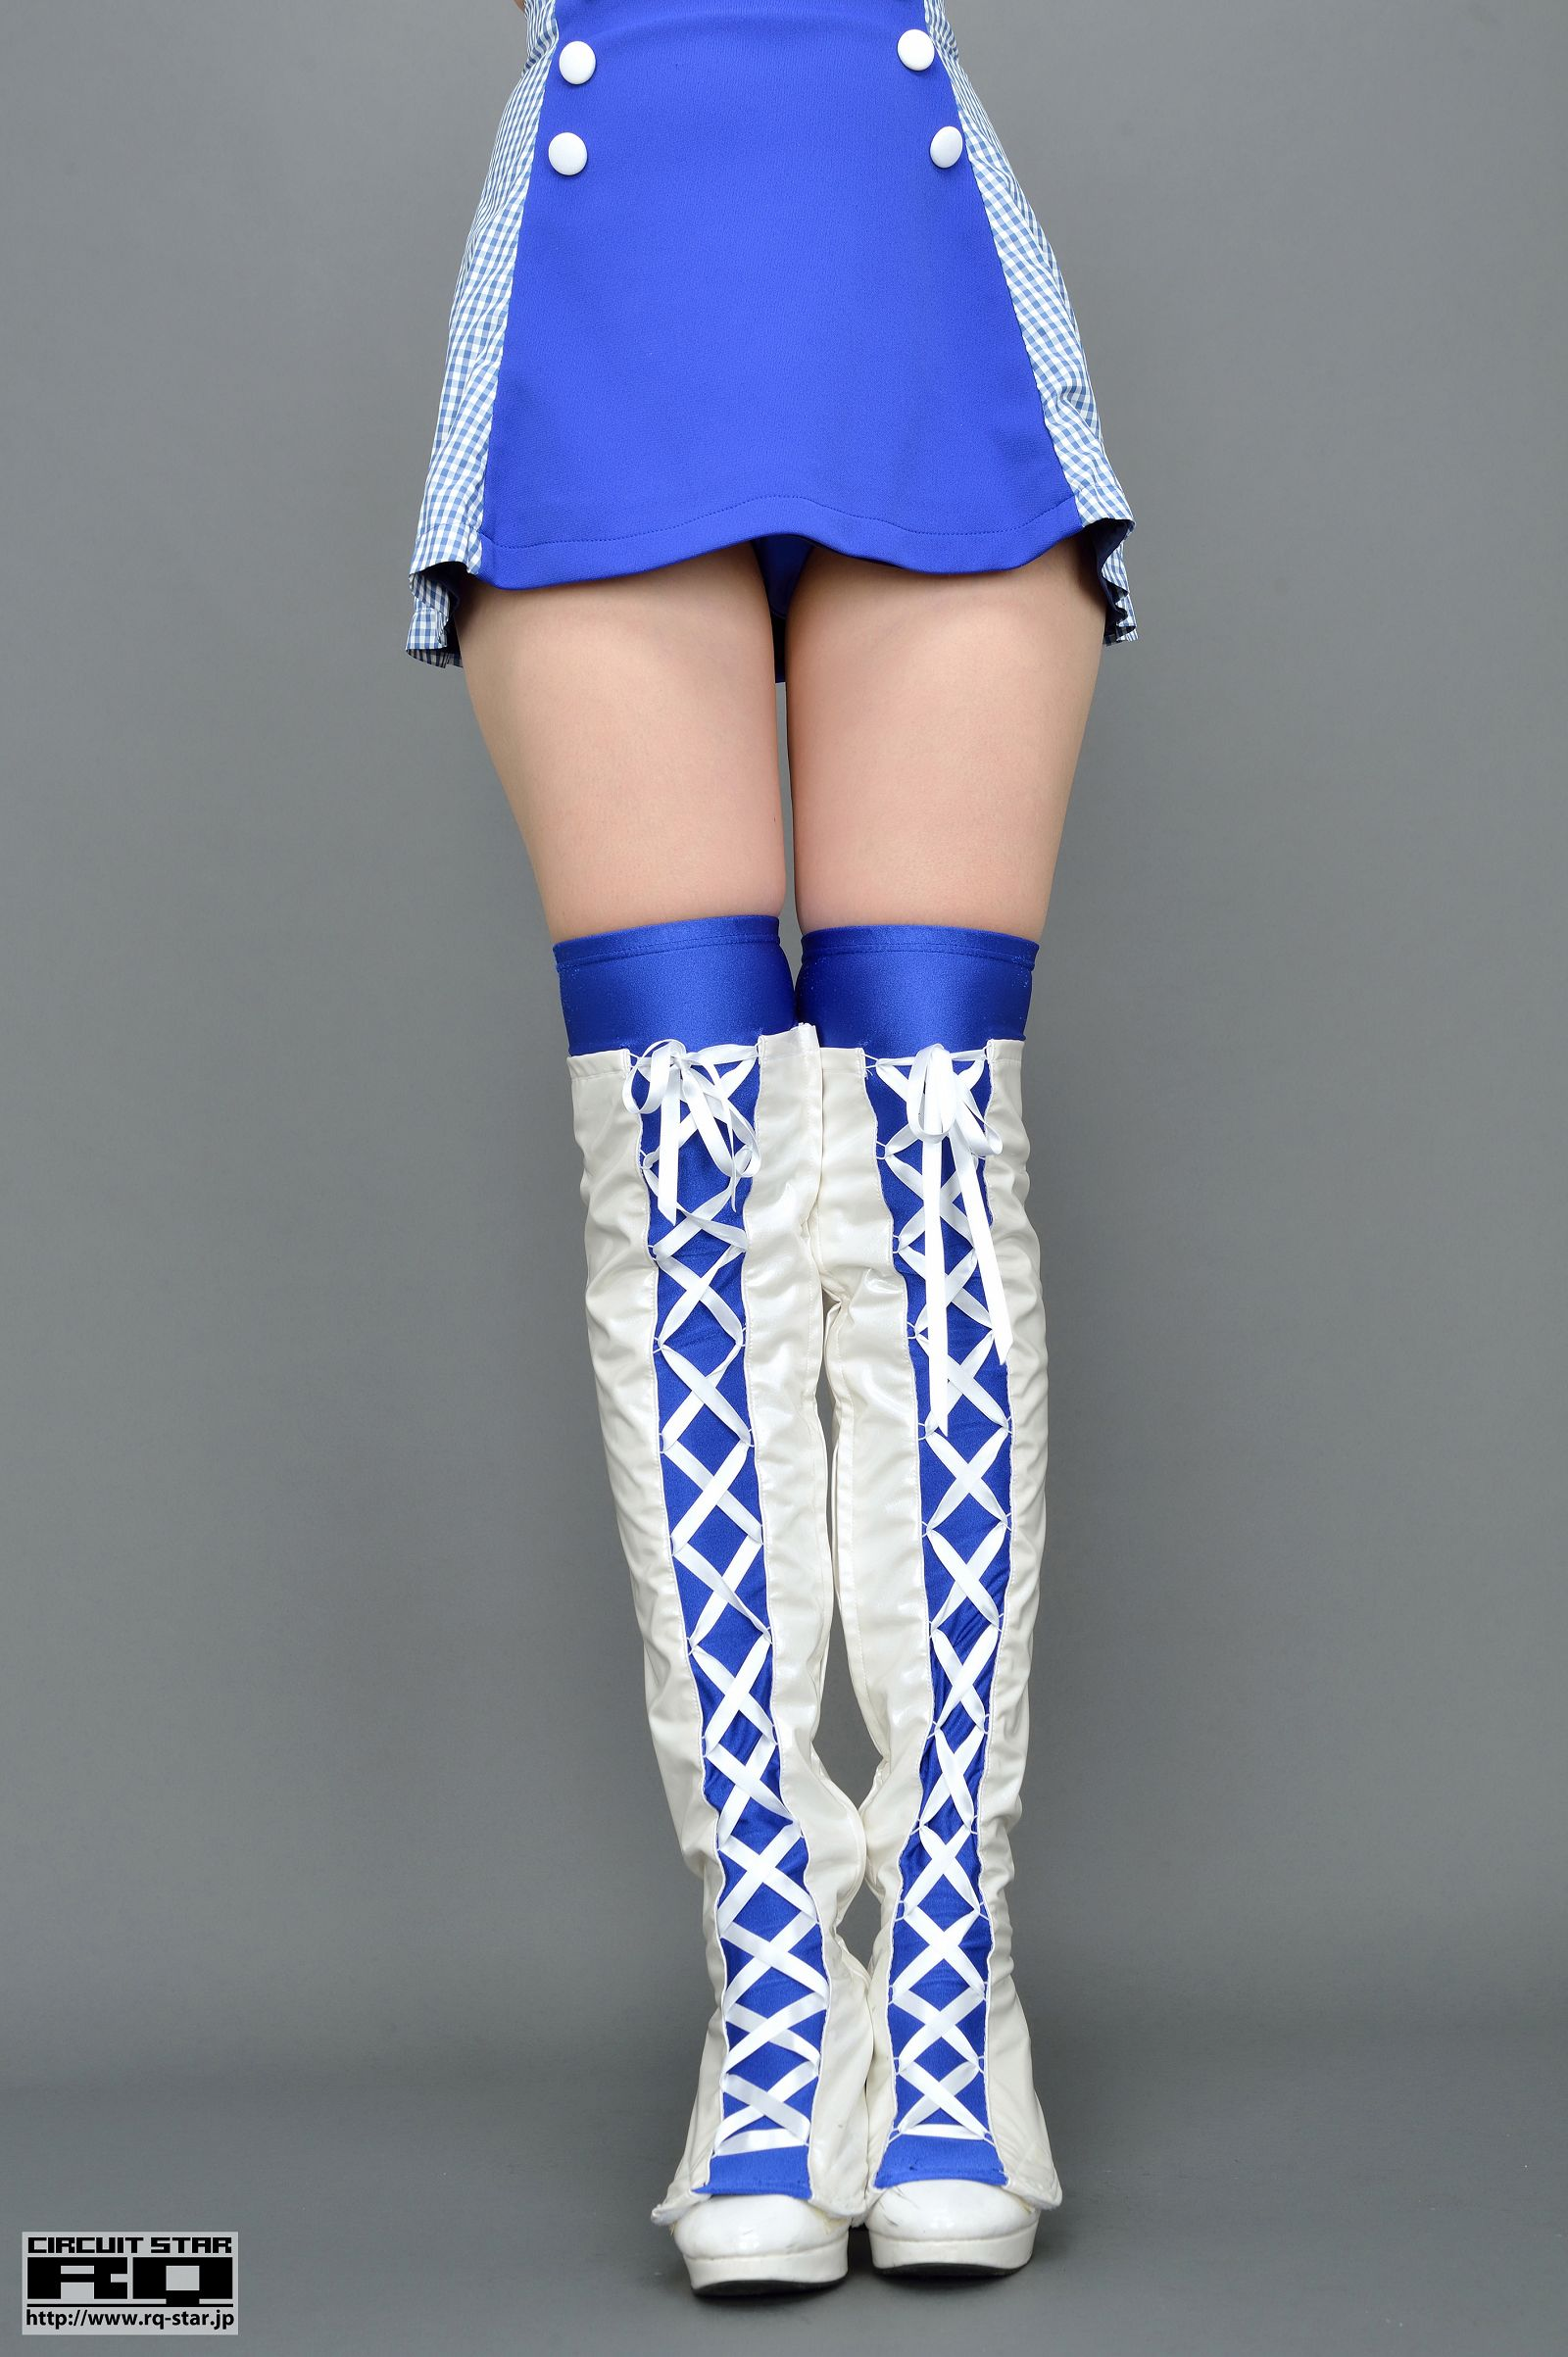 [RQ STAR美女] NO.00897 Ikumi Aihara 相原育美 Race Queen[80P] RQ STAR 第3张